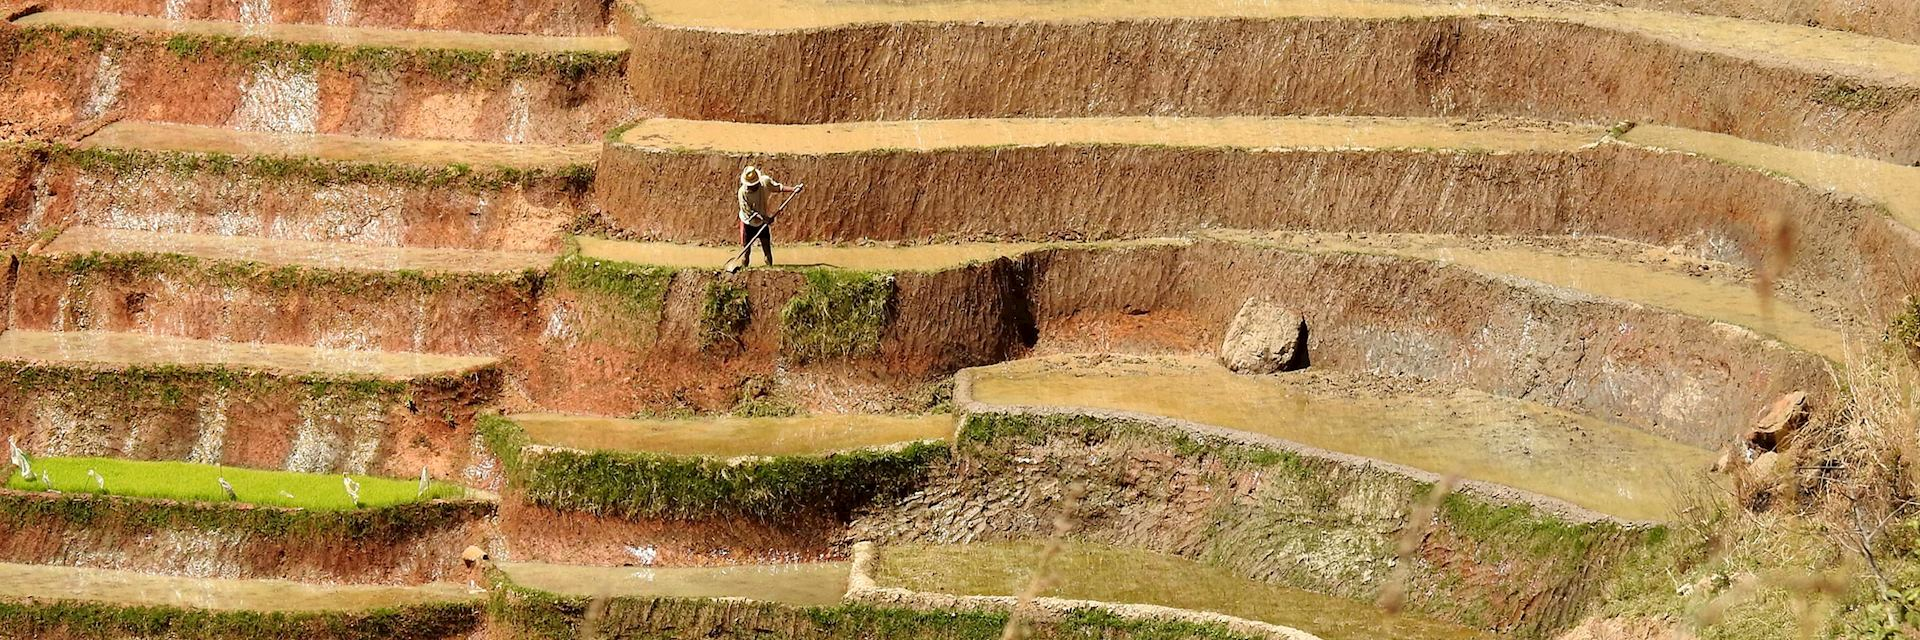 Rice farmer, Ranomafana National Park, Madagascar